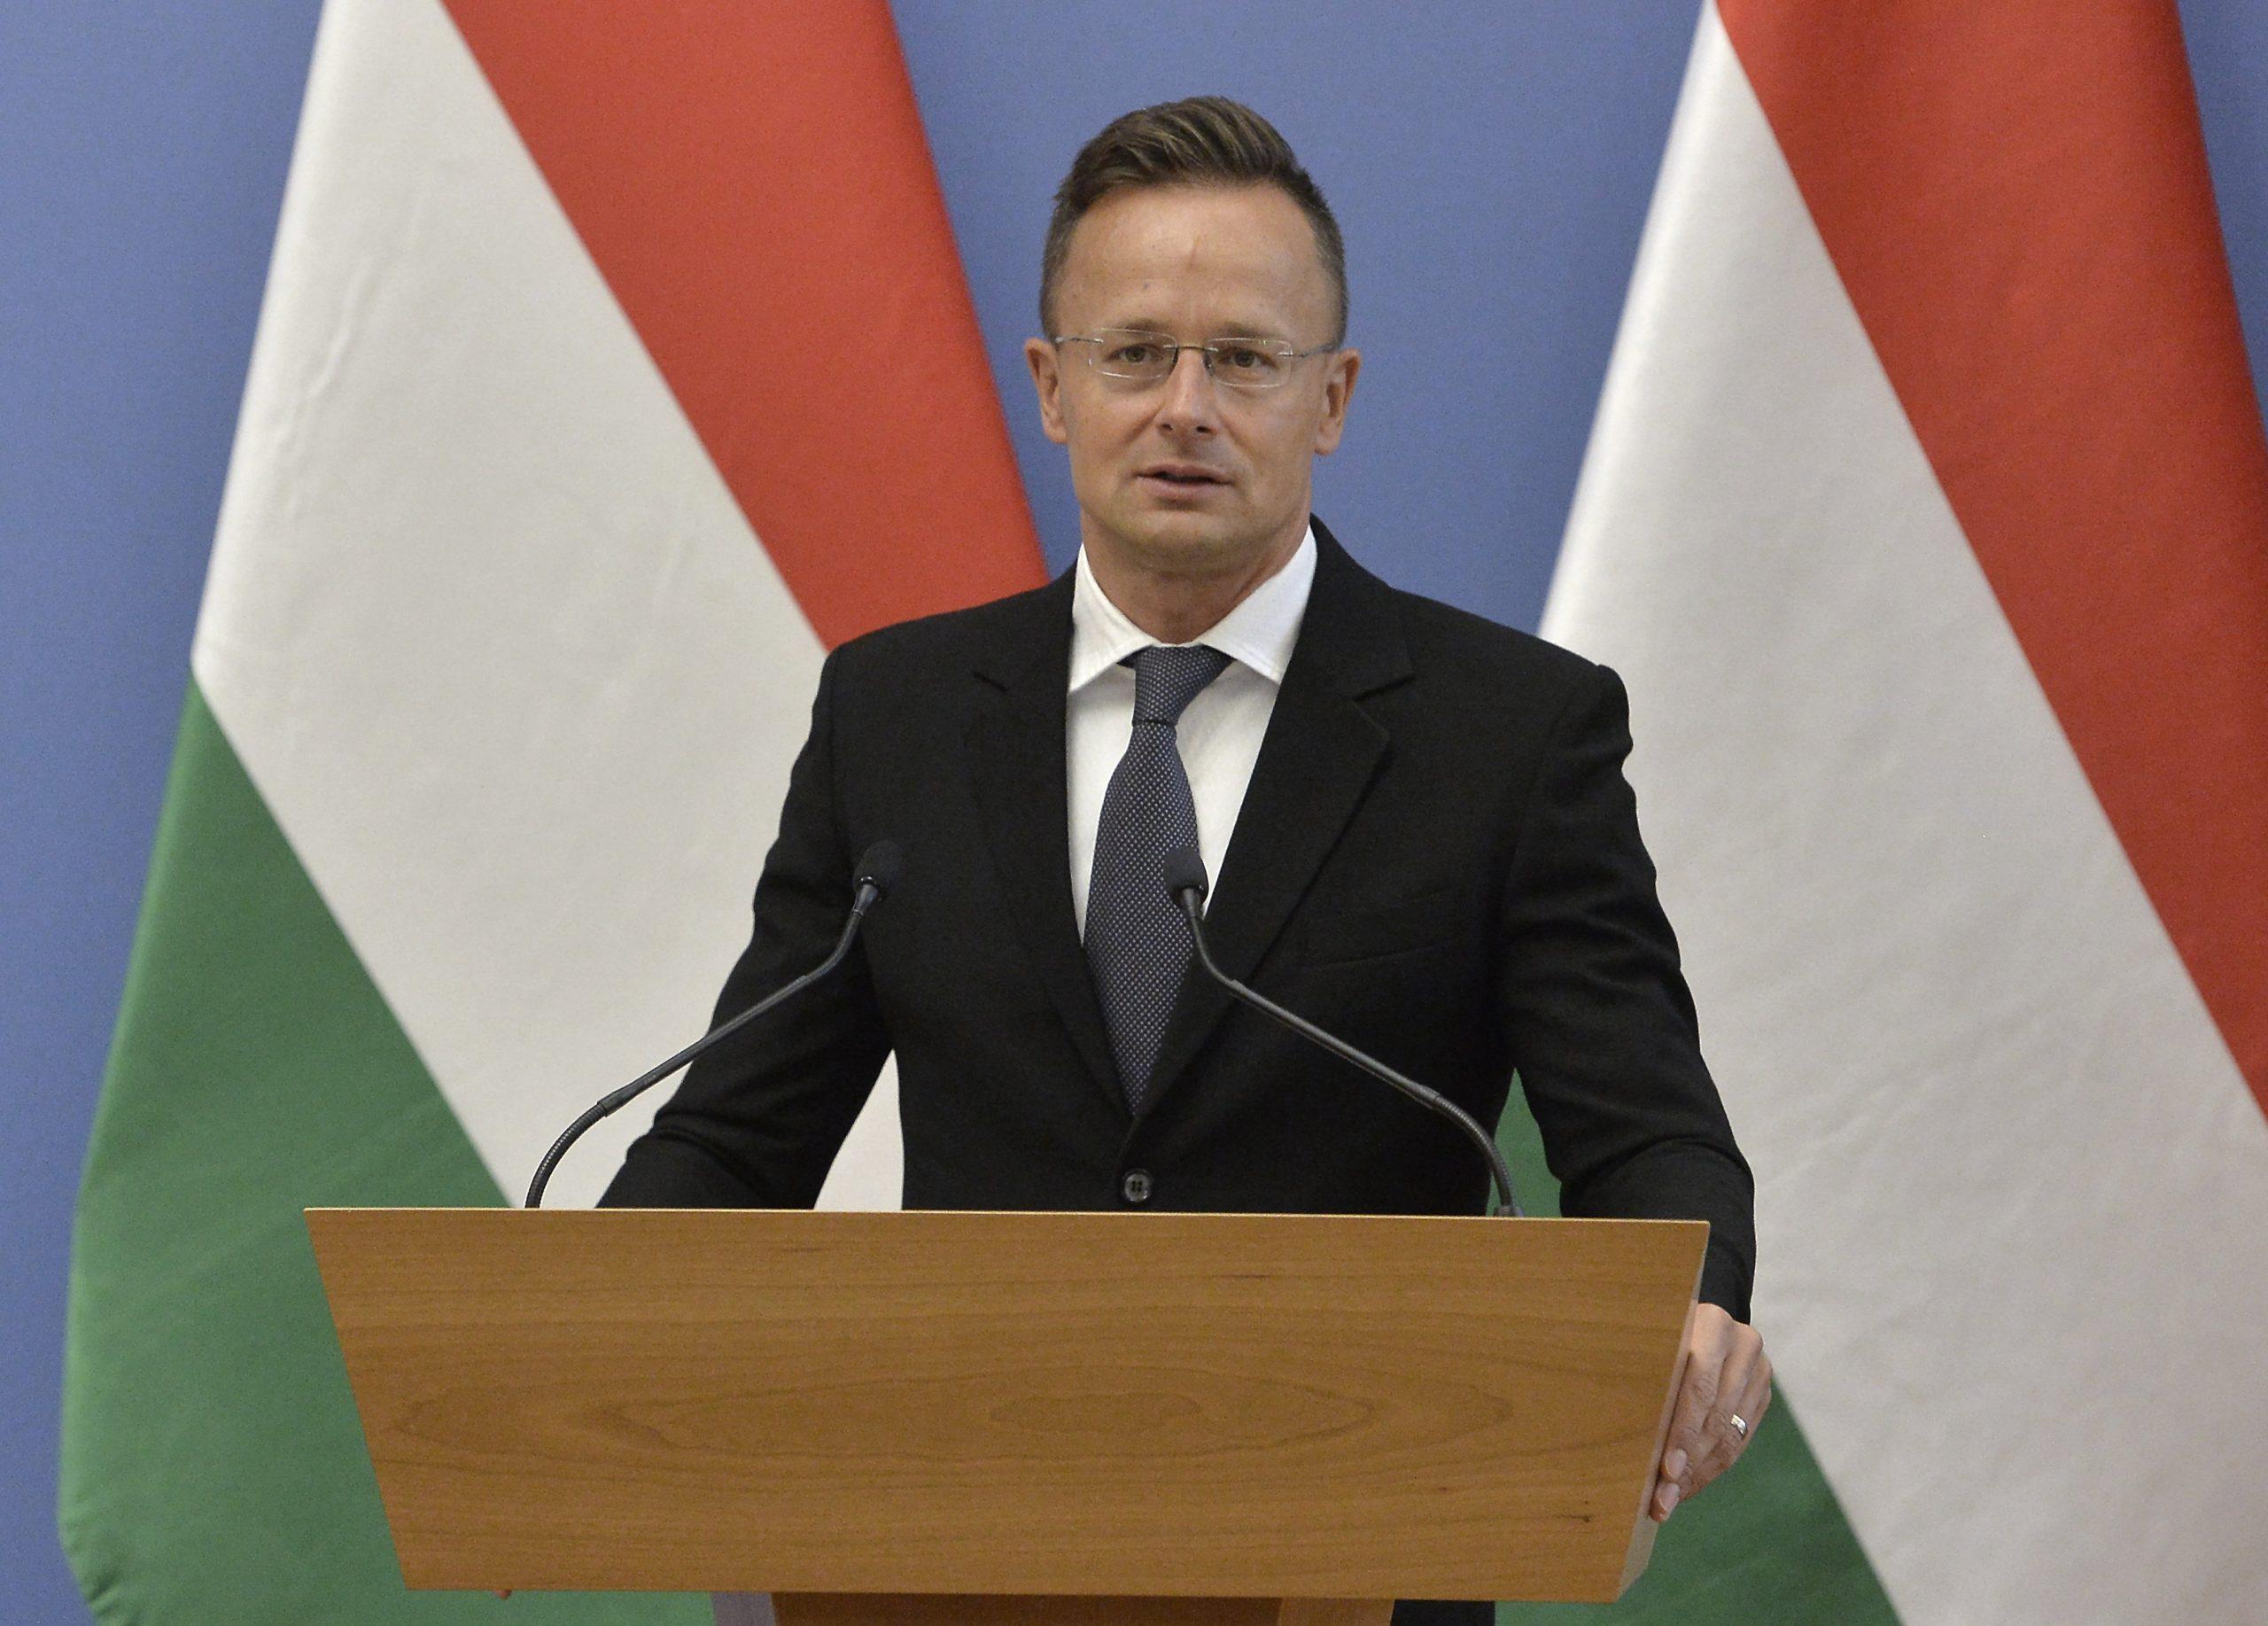 FM Szijjártó: Cooperation with Turkic Council 'Yielding Significant Profits'